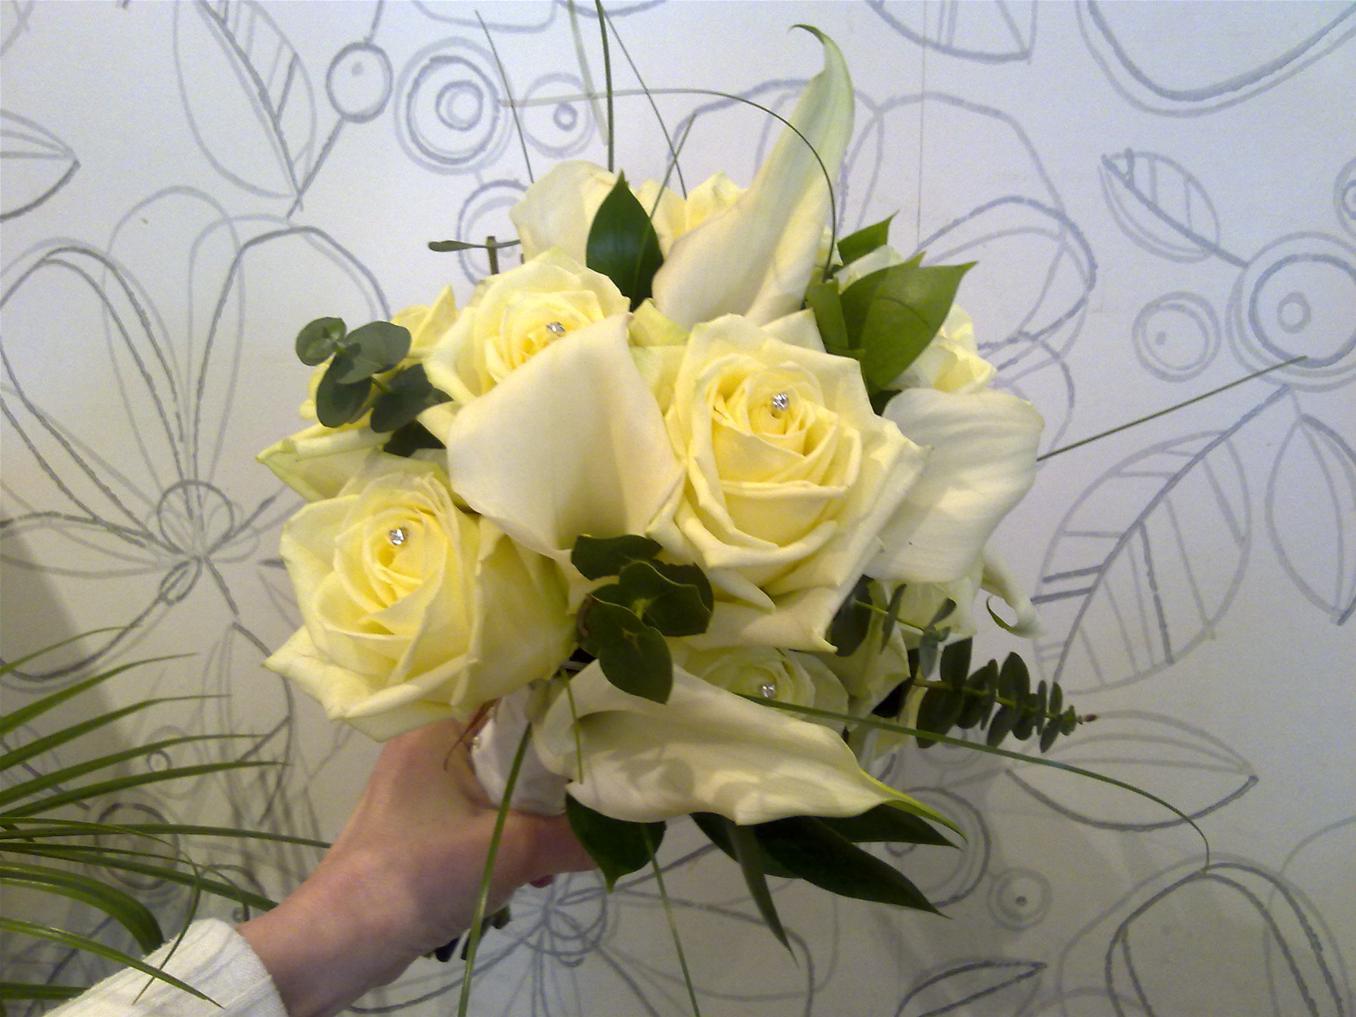 Wedding flowers bolton flower design florist wedding flowers by design izmirmasajfo